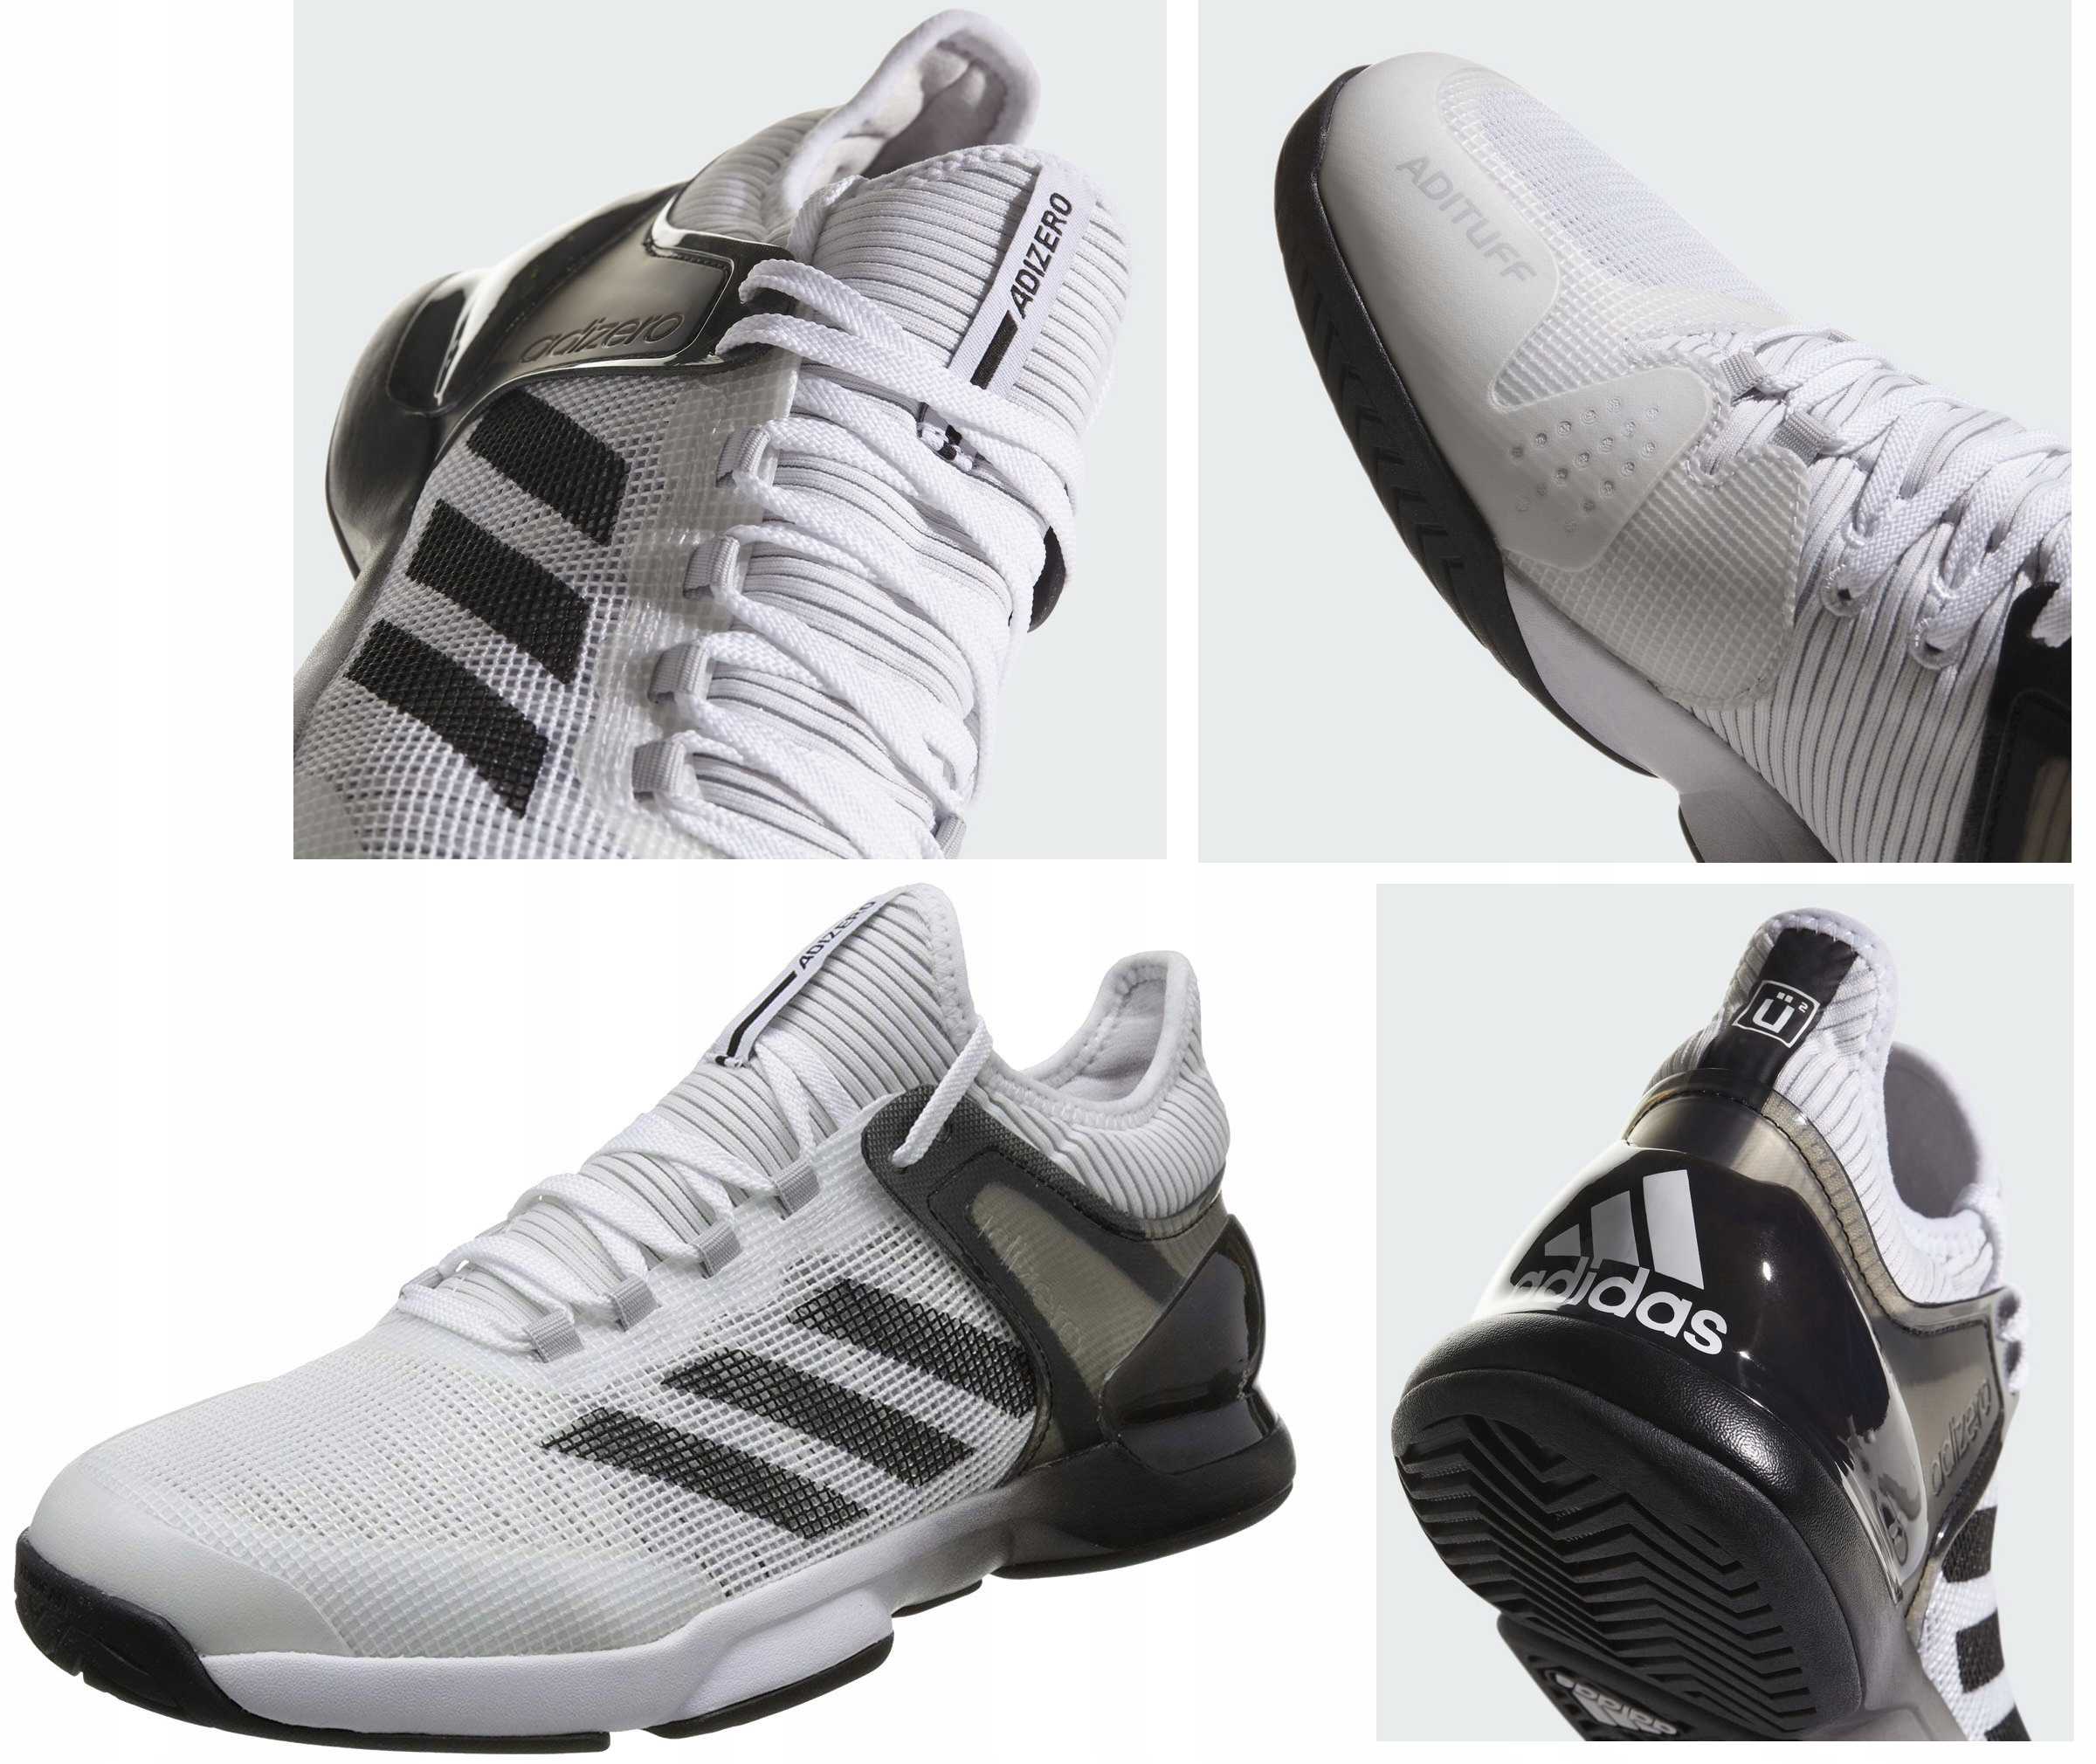 Buty męskie Adidas Adizero Attack AQ2364 41 i 13